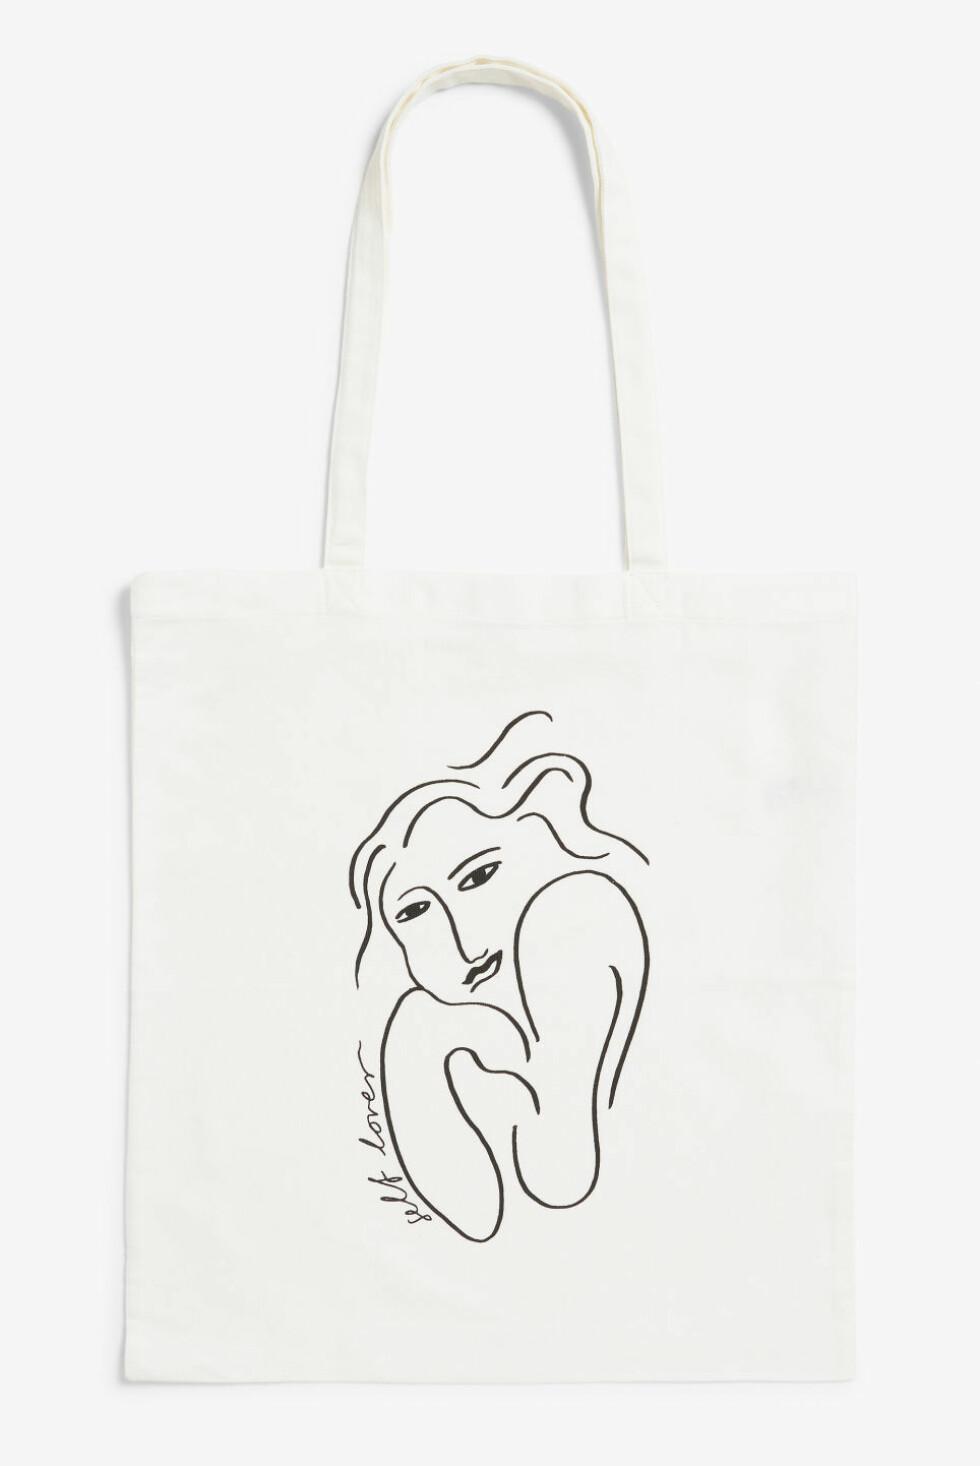 Tote fra Monki  80,-  https://www.monki.com/en_sek/accessories/view-all-accessories/product.tote-bag-self-lover.0517599026.html